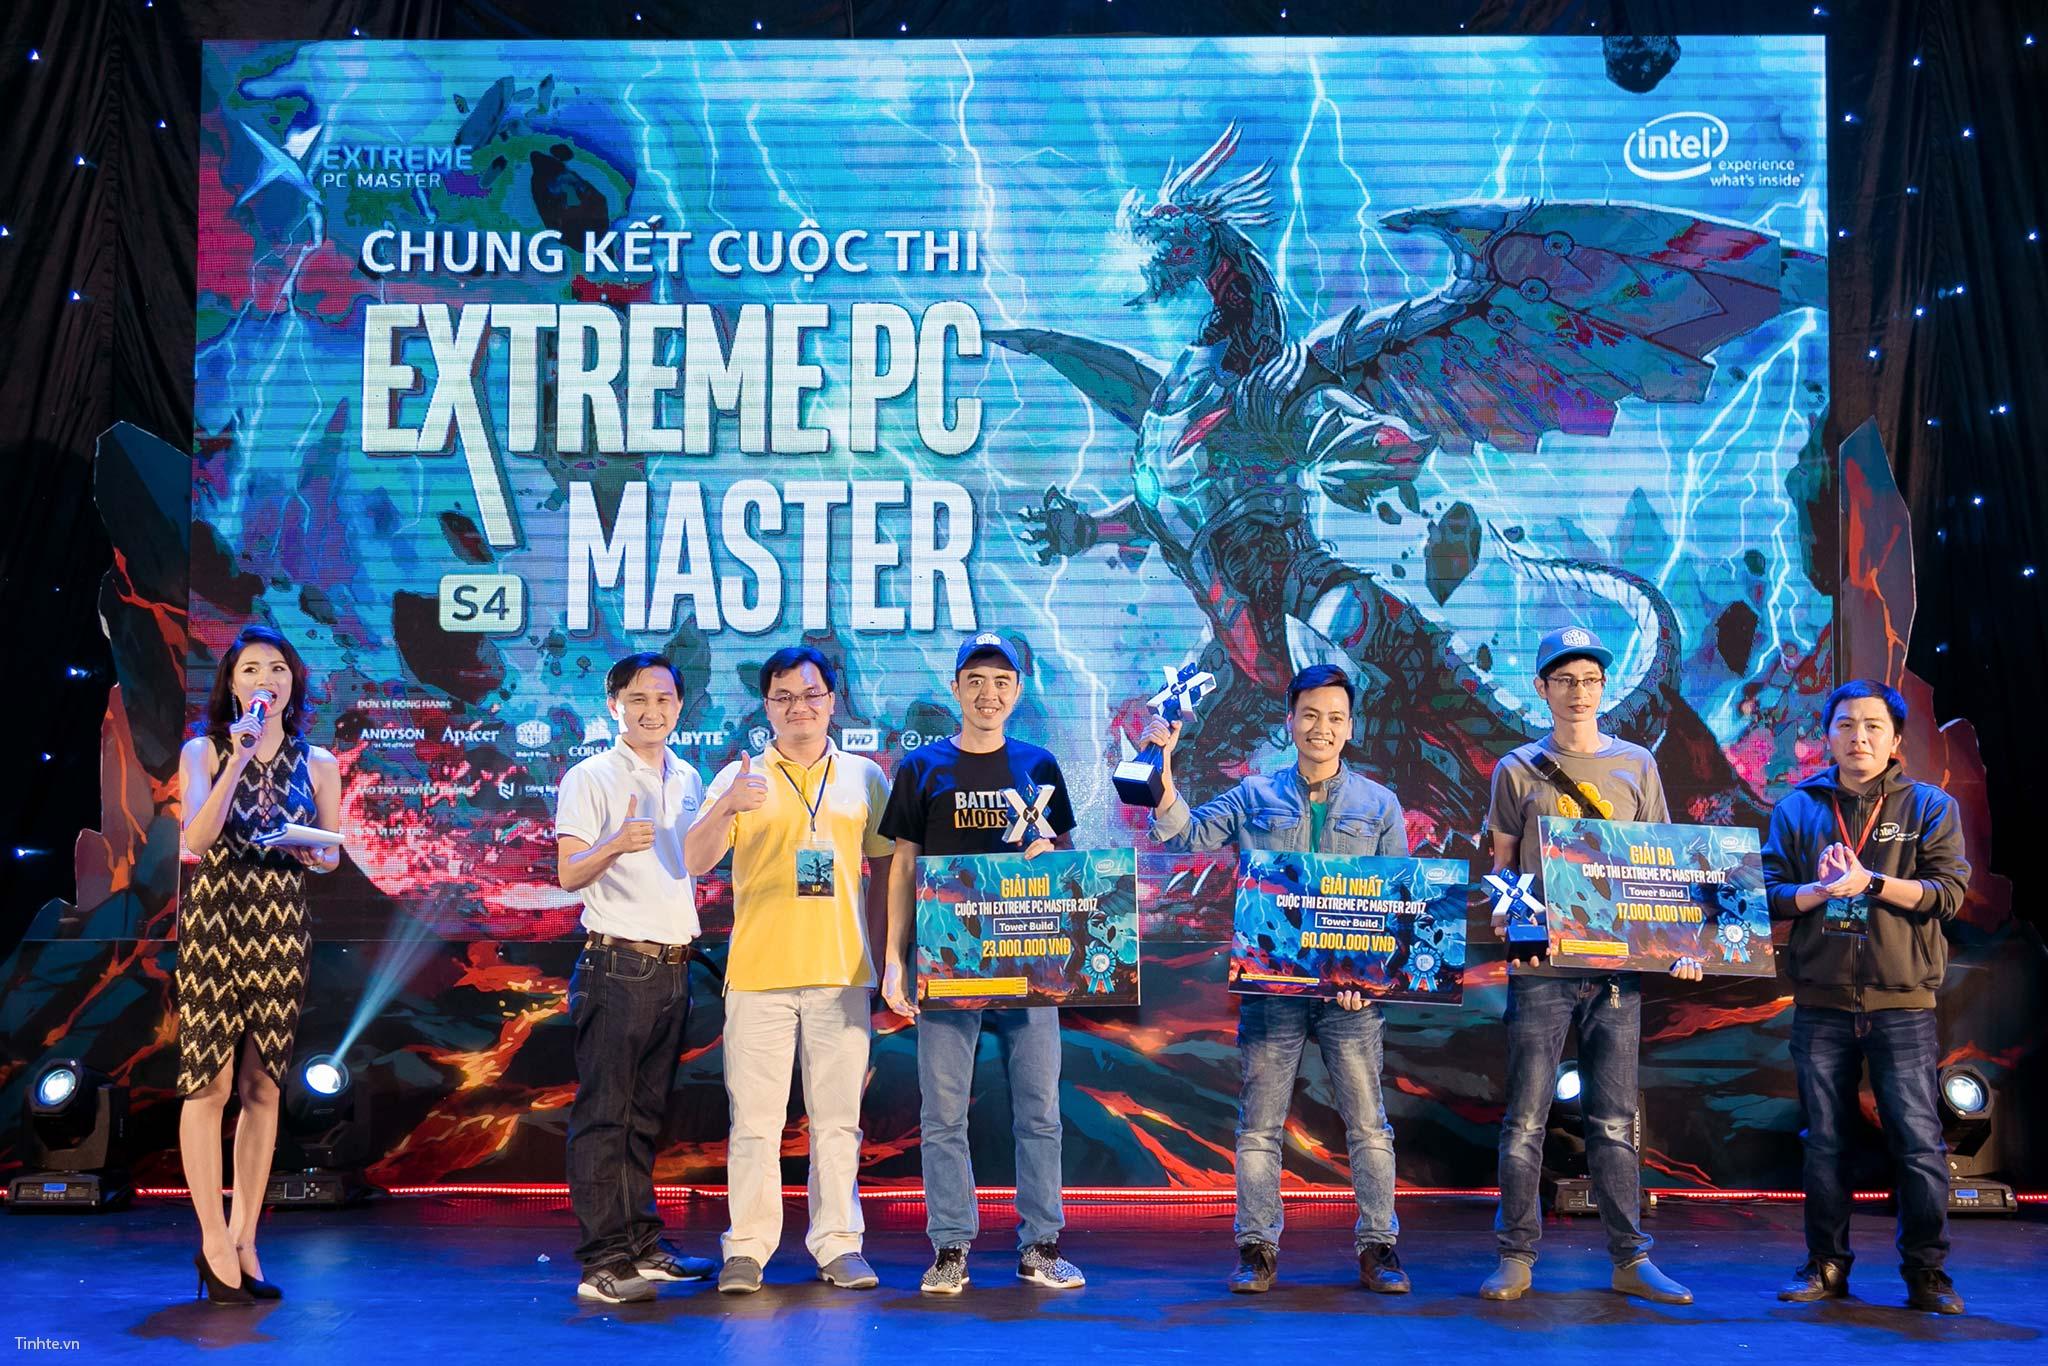 Intel Extreme PC Master (30).jpg